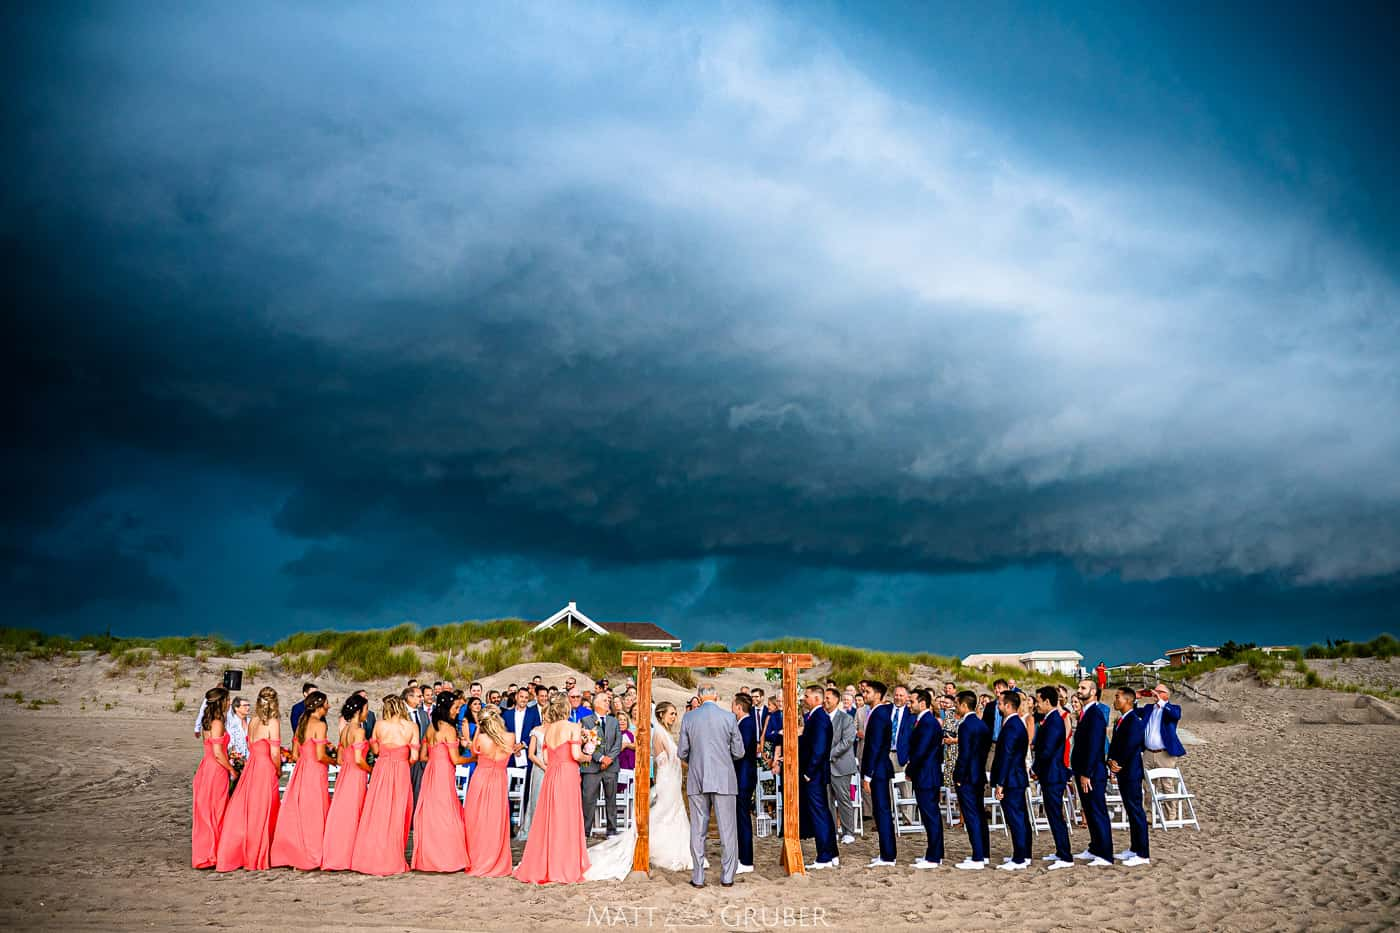 a summer storm rolls through a wedding ceremony at ICONA Avalon